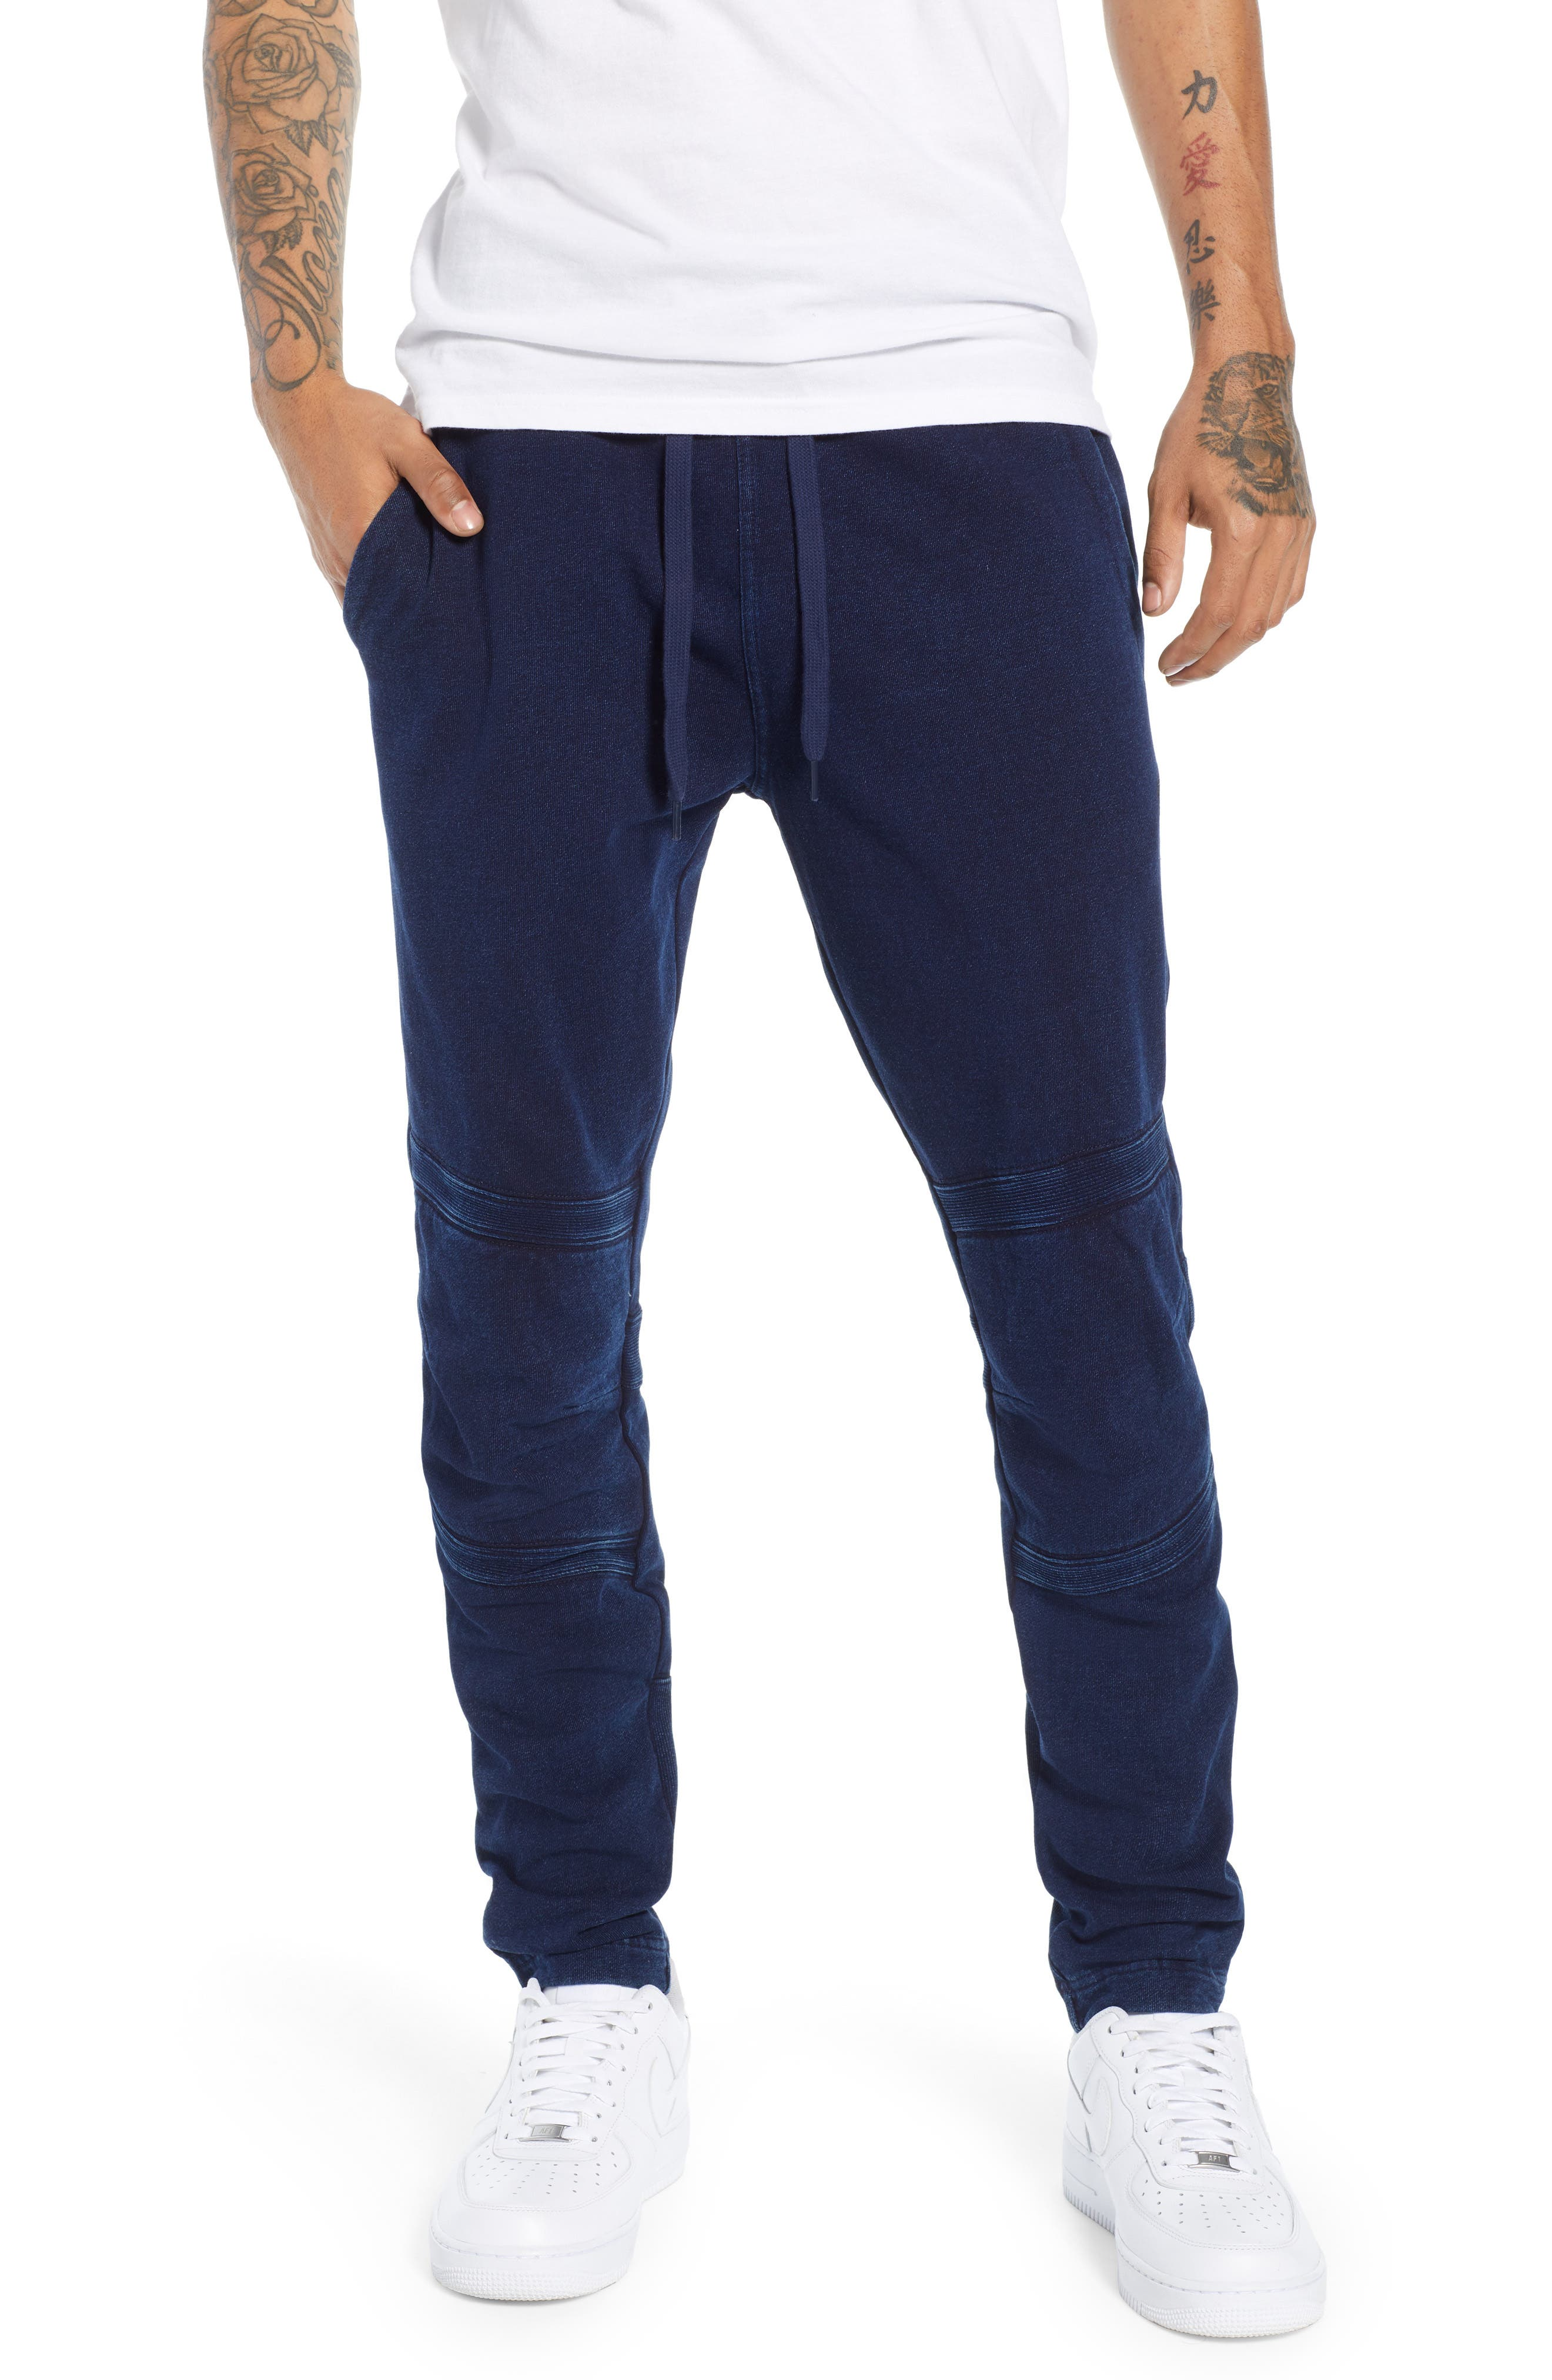 G-STAR RAW,                             Motac-X Slim Fit Sweat Pants,                             Main thumbnail 1, color,                             001